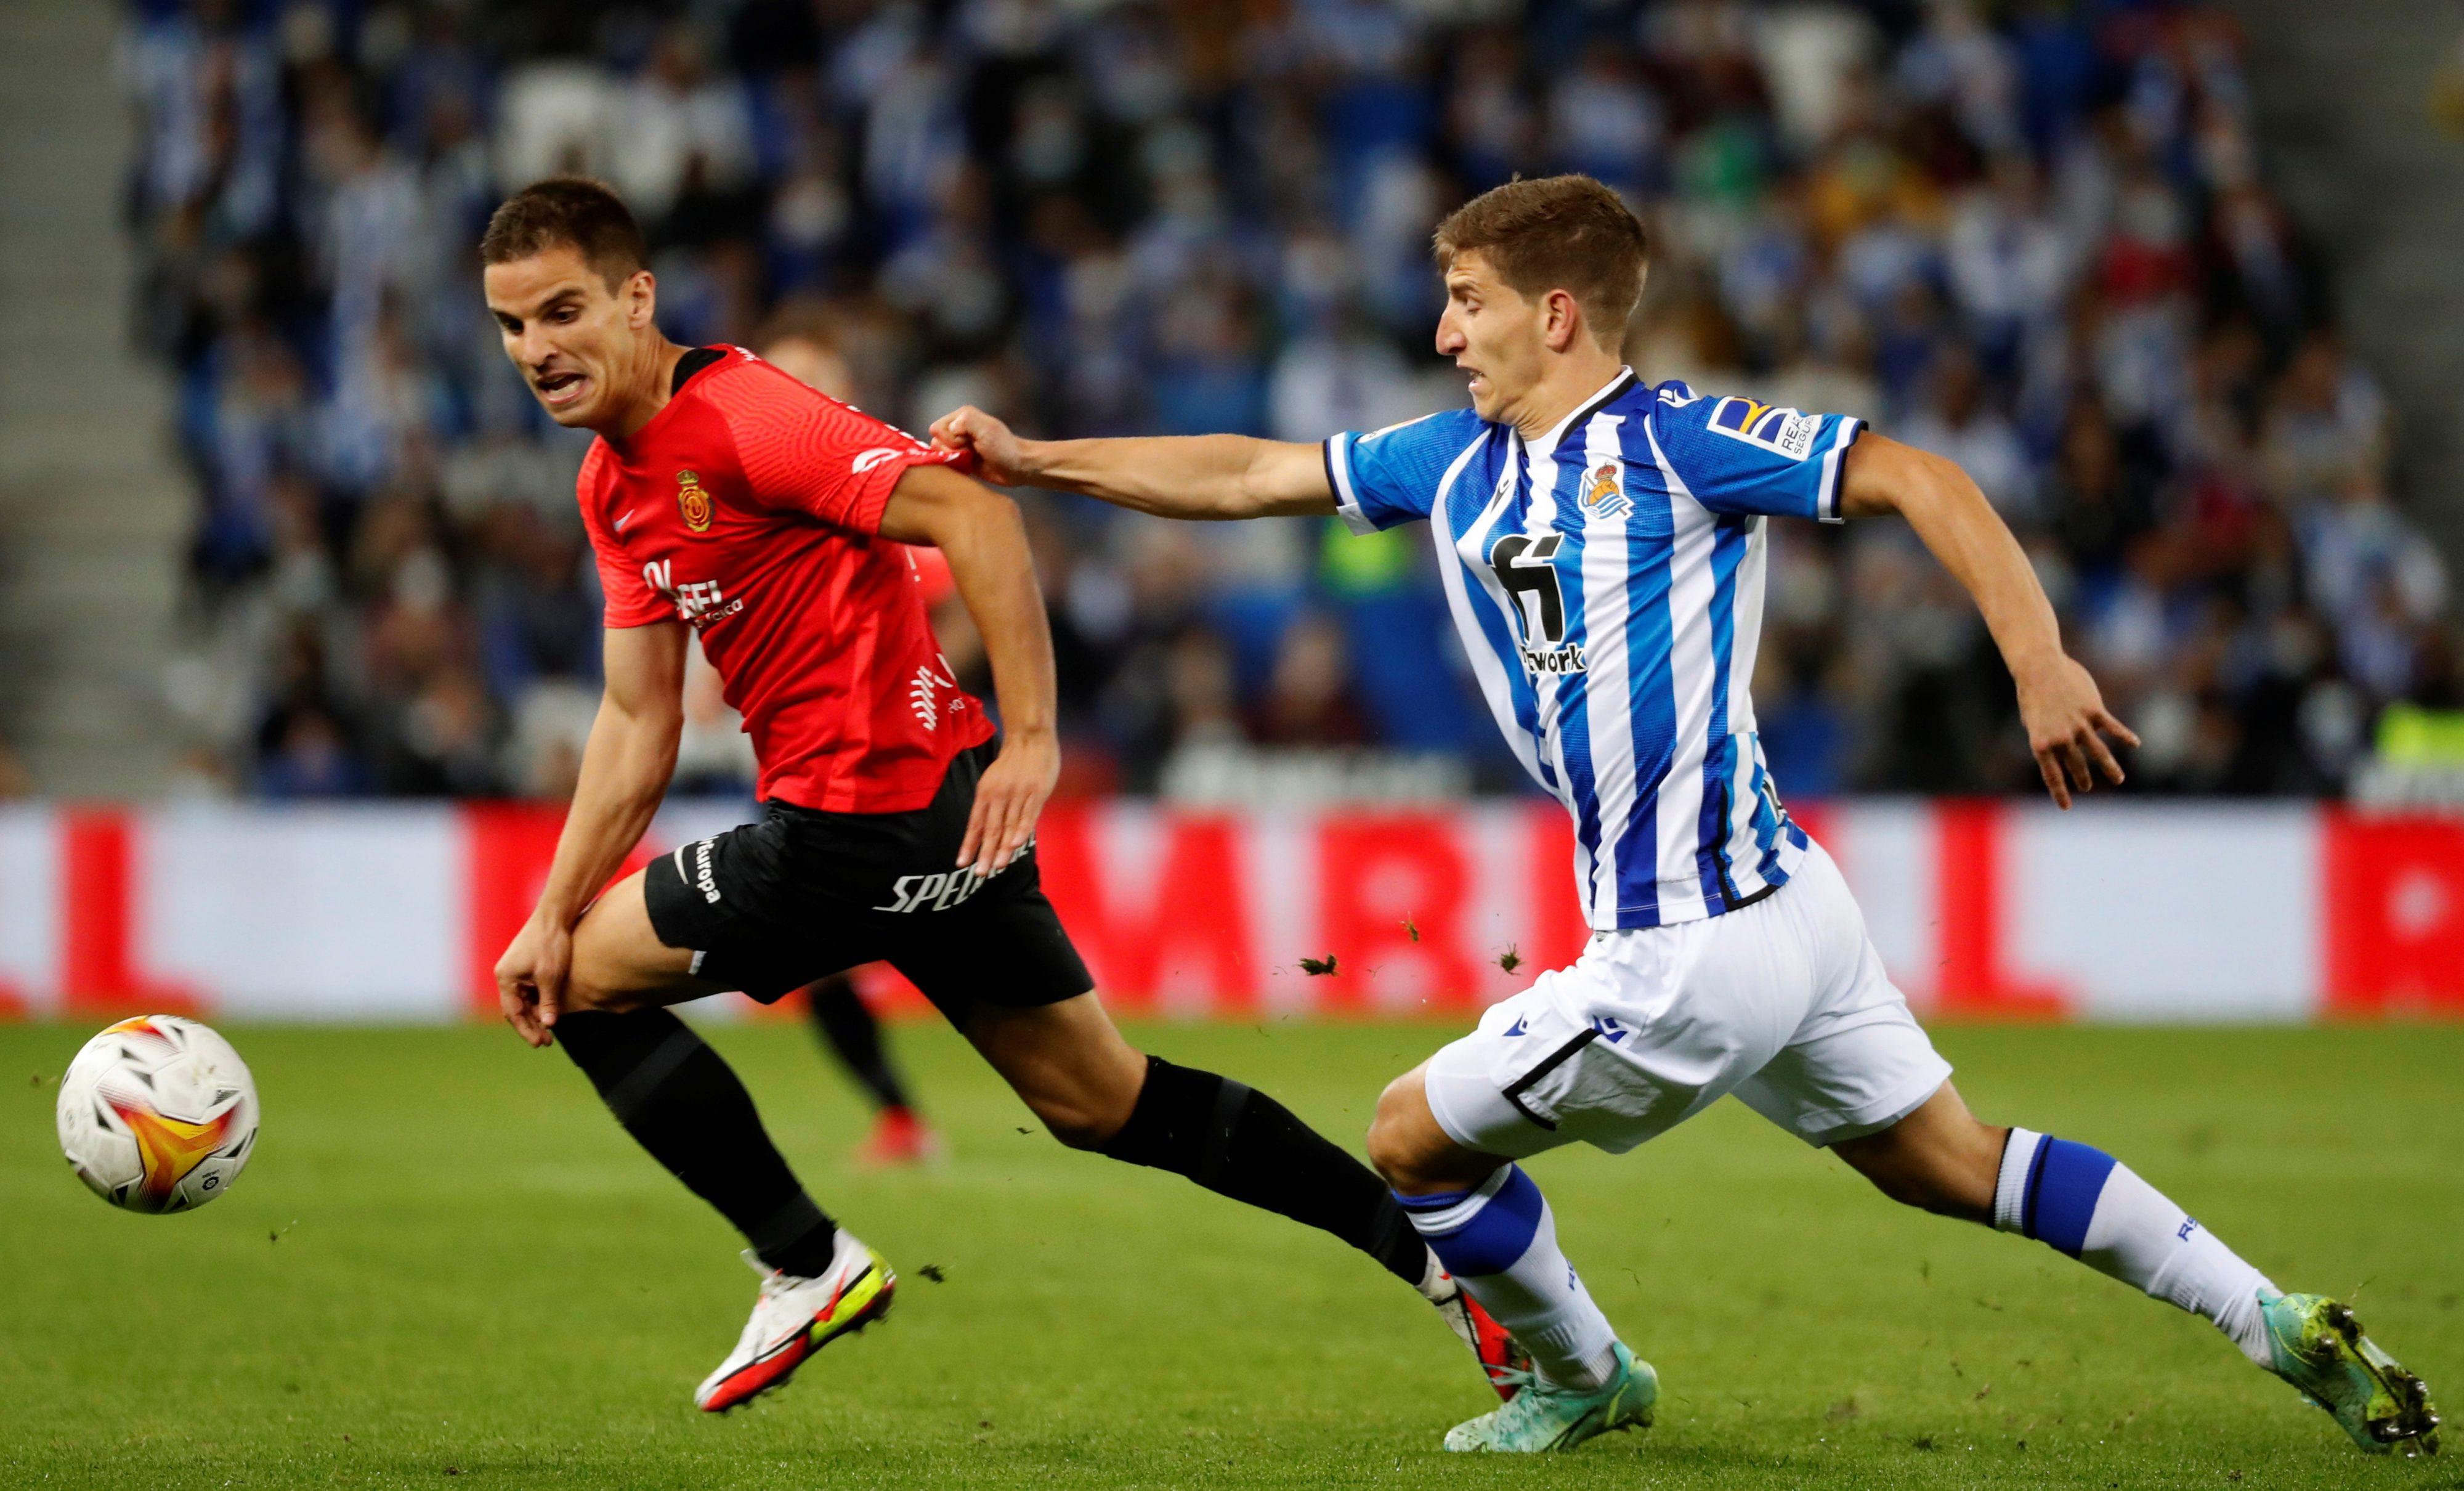 Real Sociedad zabio u 90. minuti i preuzeo vrh Primere